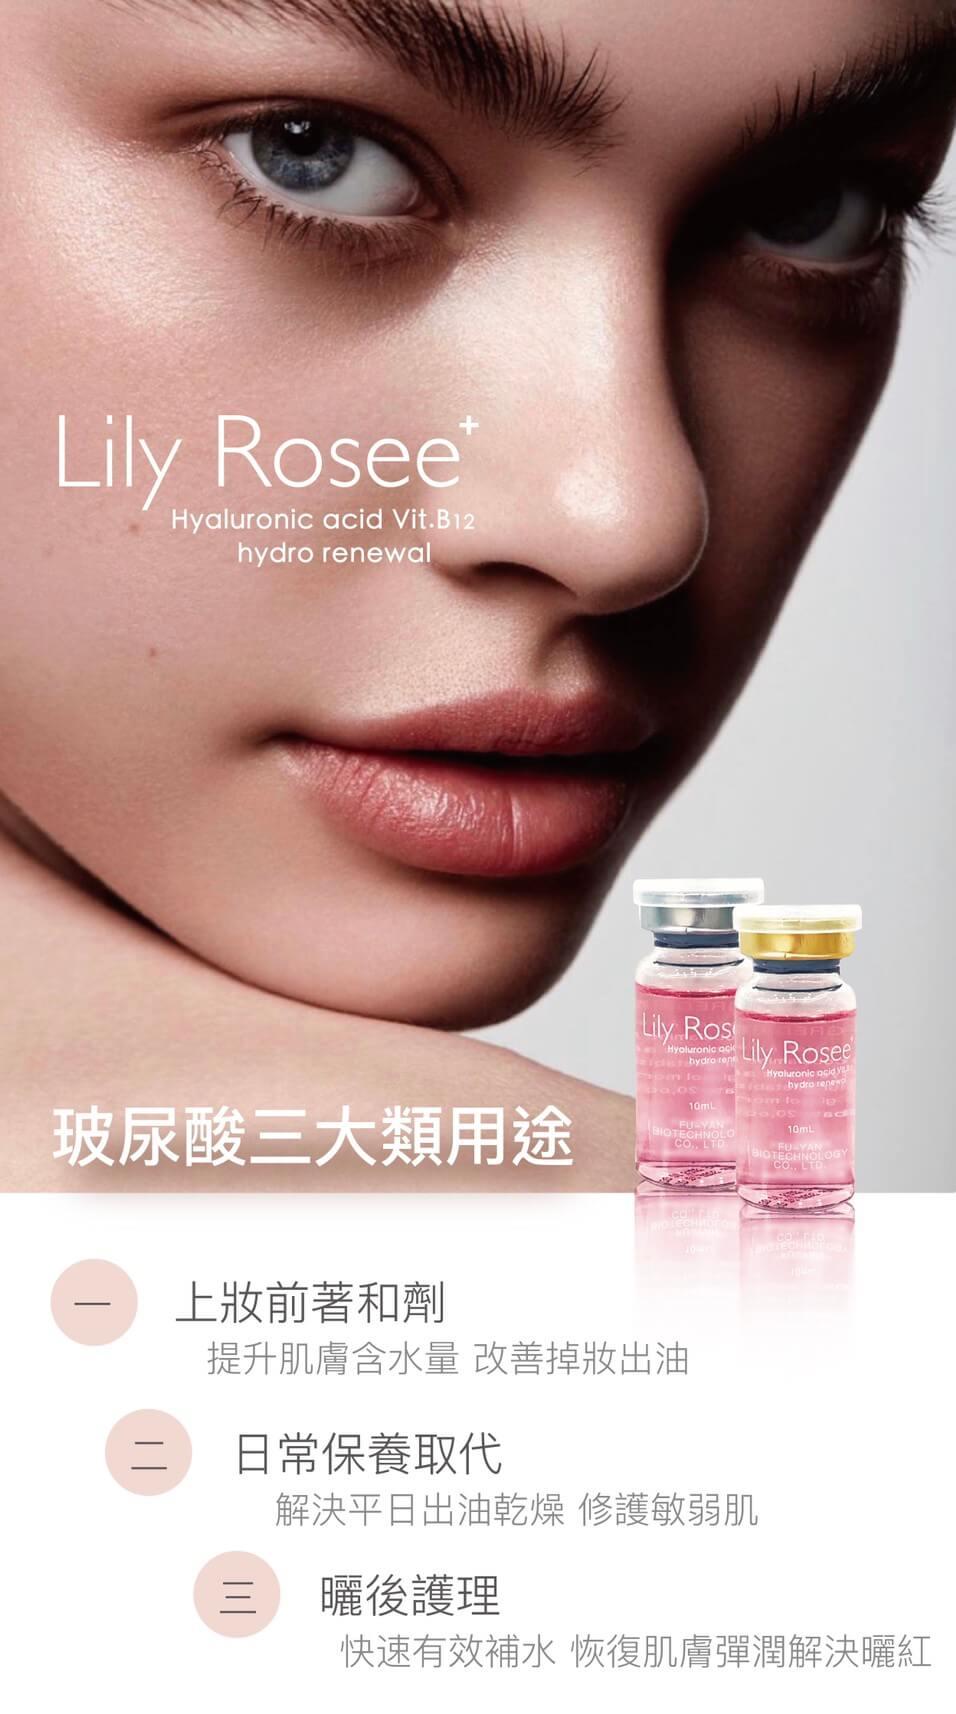 Lily Rosee玻尿酸三大用途